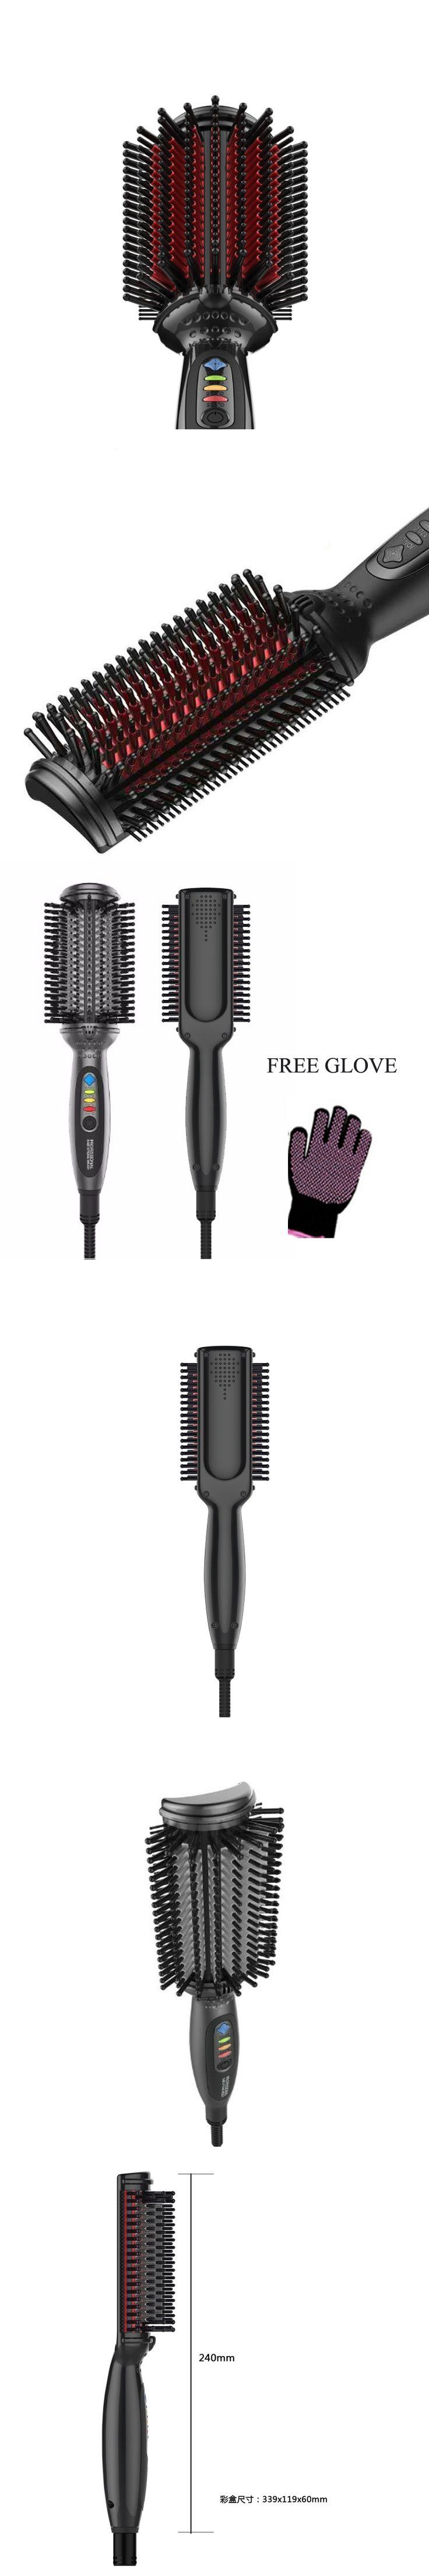 Hair Straightener Brush Cordless Hair Straightener Iron Electric Hair Brush Ceramic Hair Straightener Comb With Glove